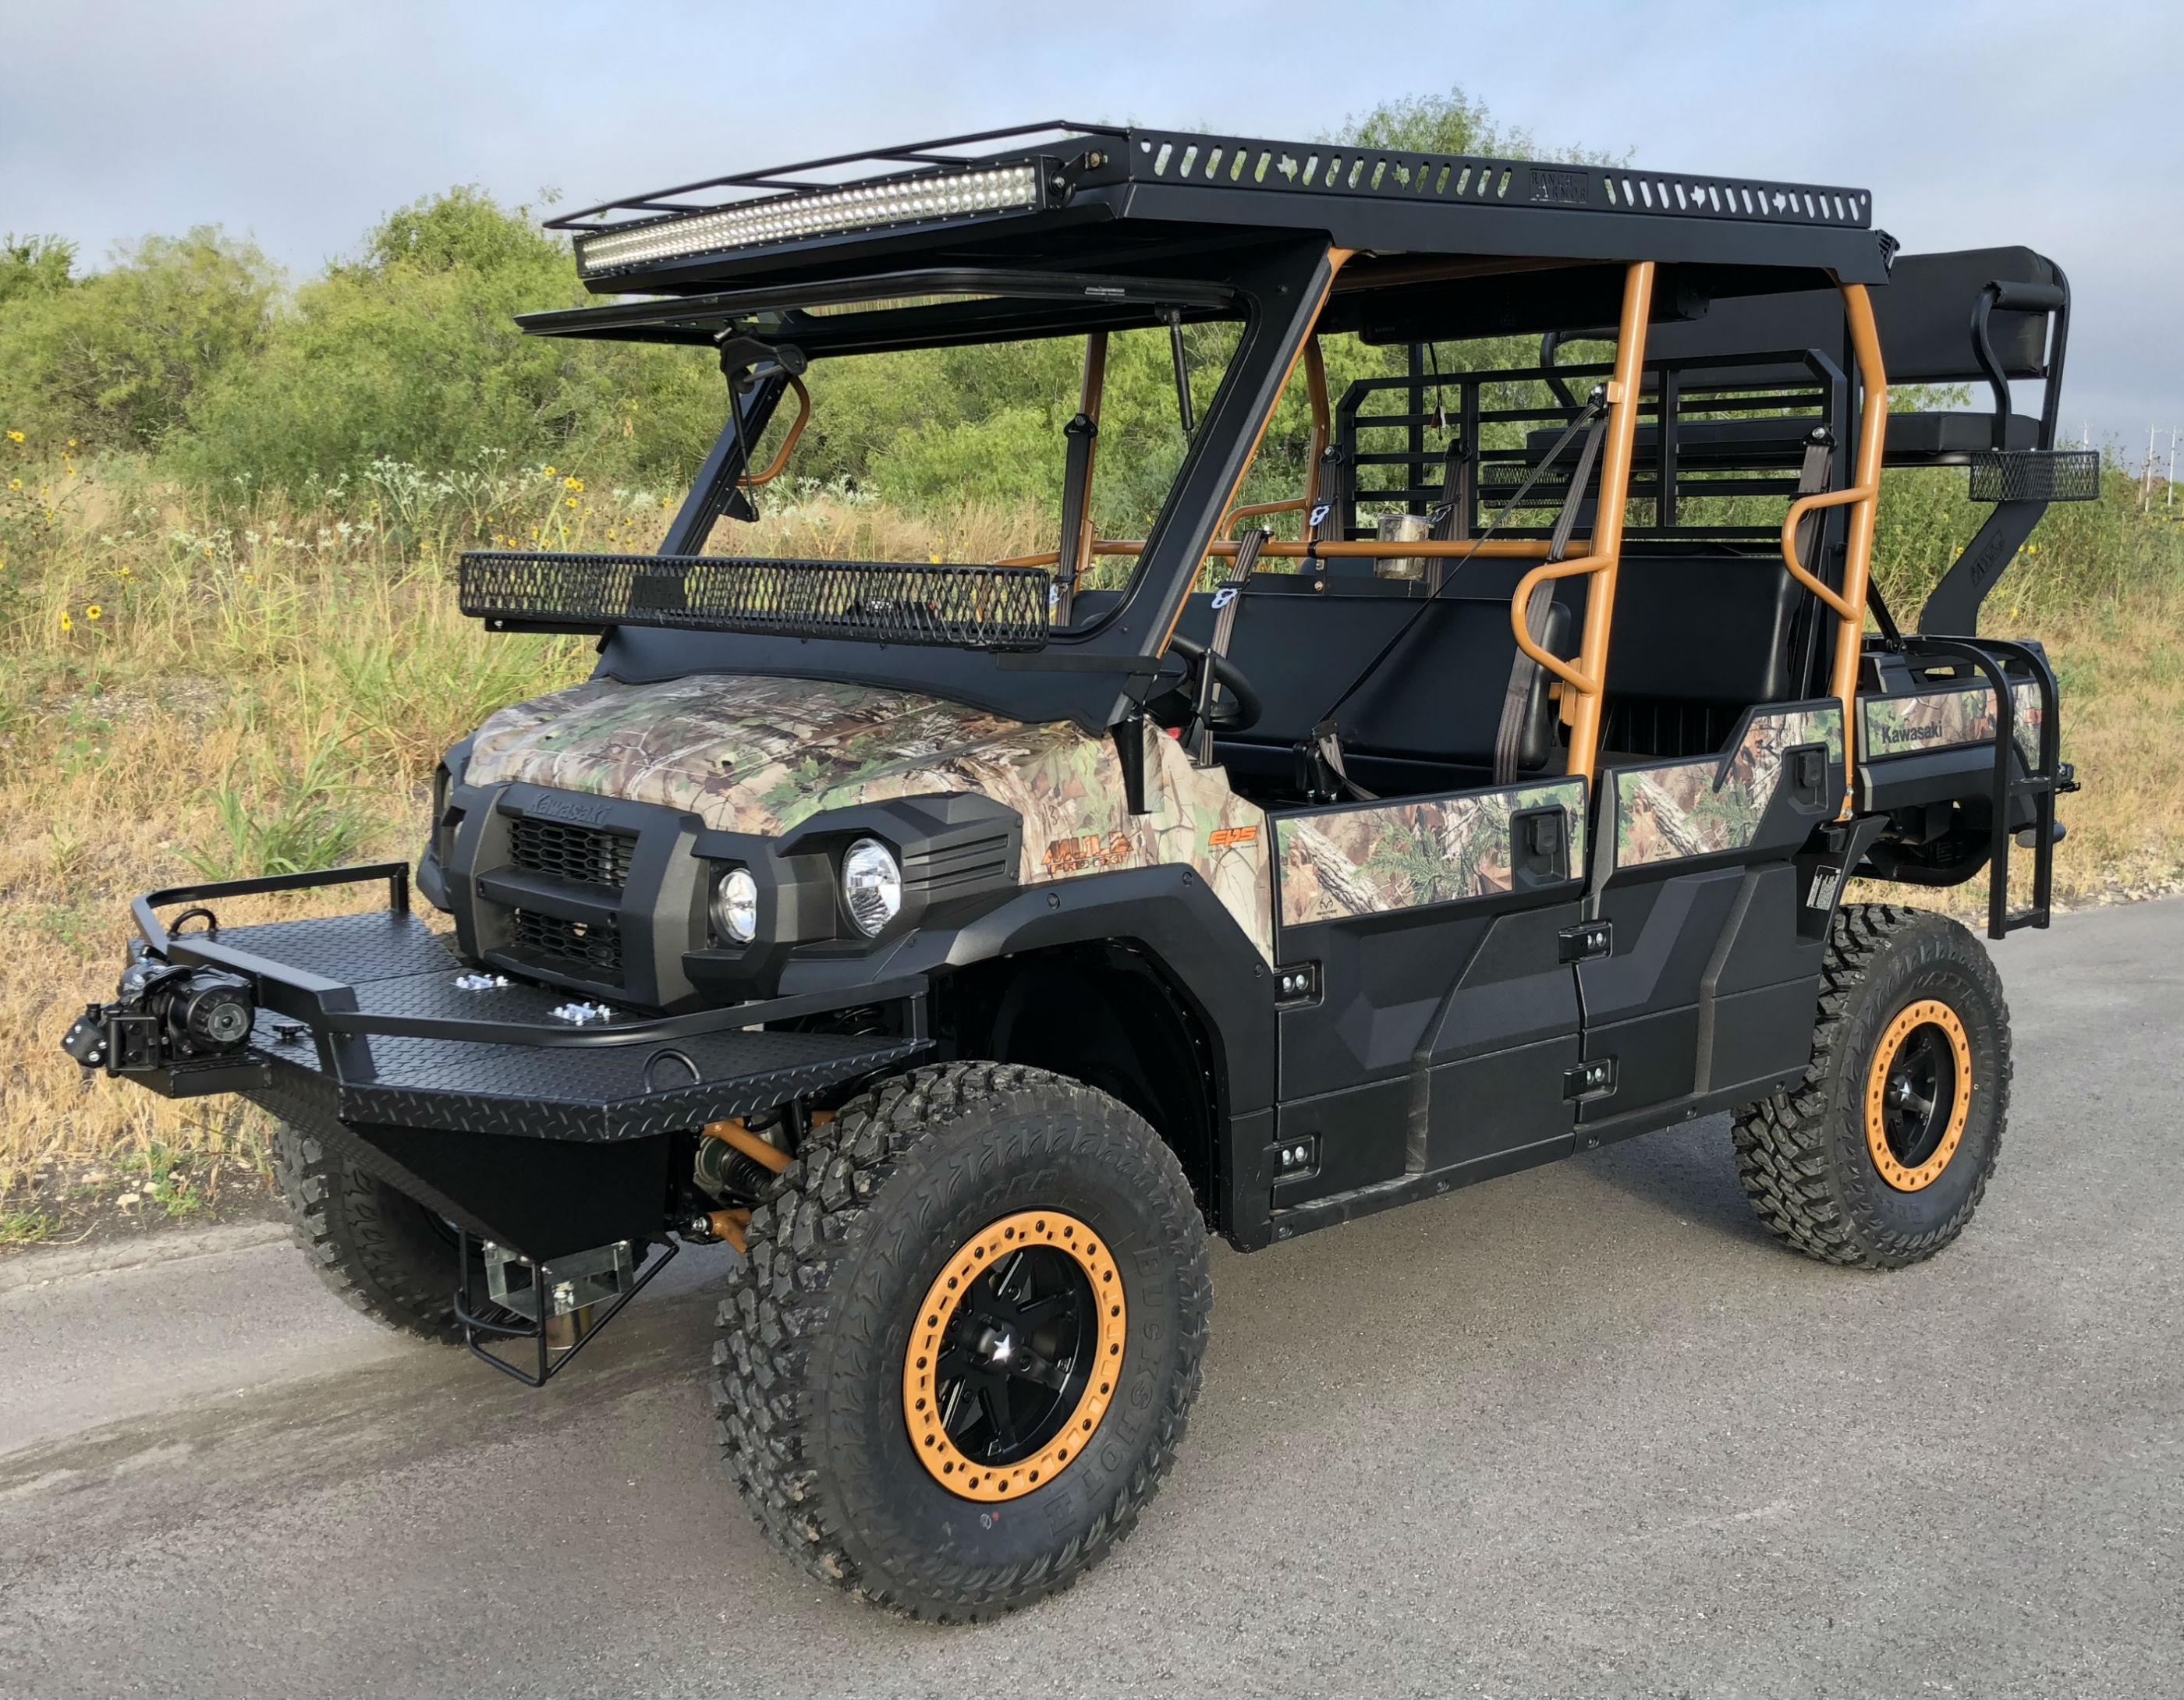 kawasaki-mule-pro-fxt-outfitted-high-seat-feeder-bumper-lift-aluminum-top.-project-caramel-.jpg